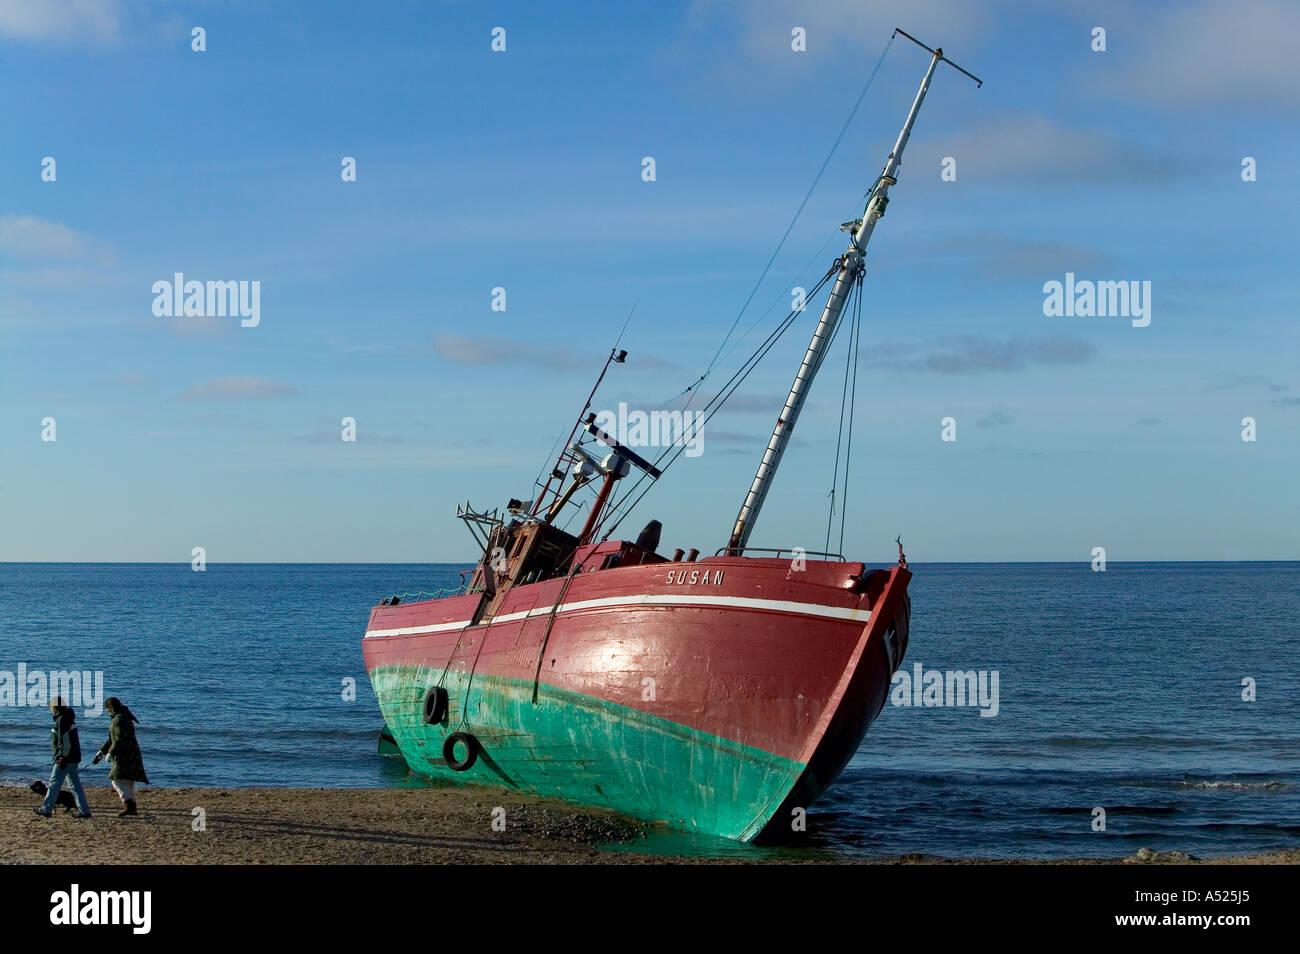 Shipwreck - Stock Image